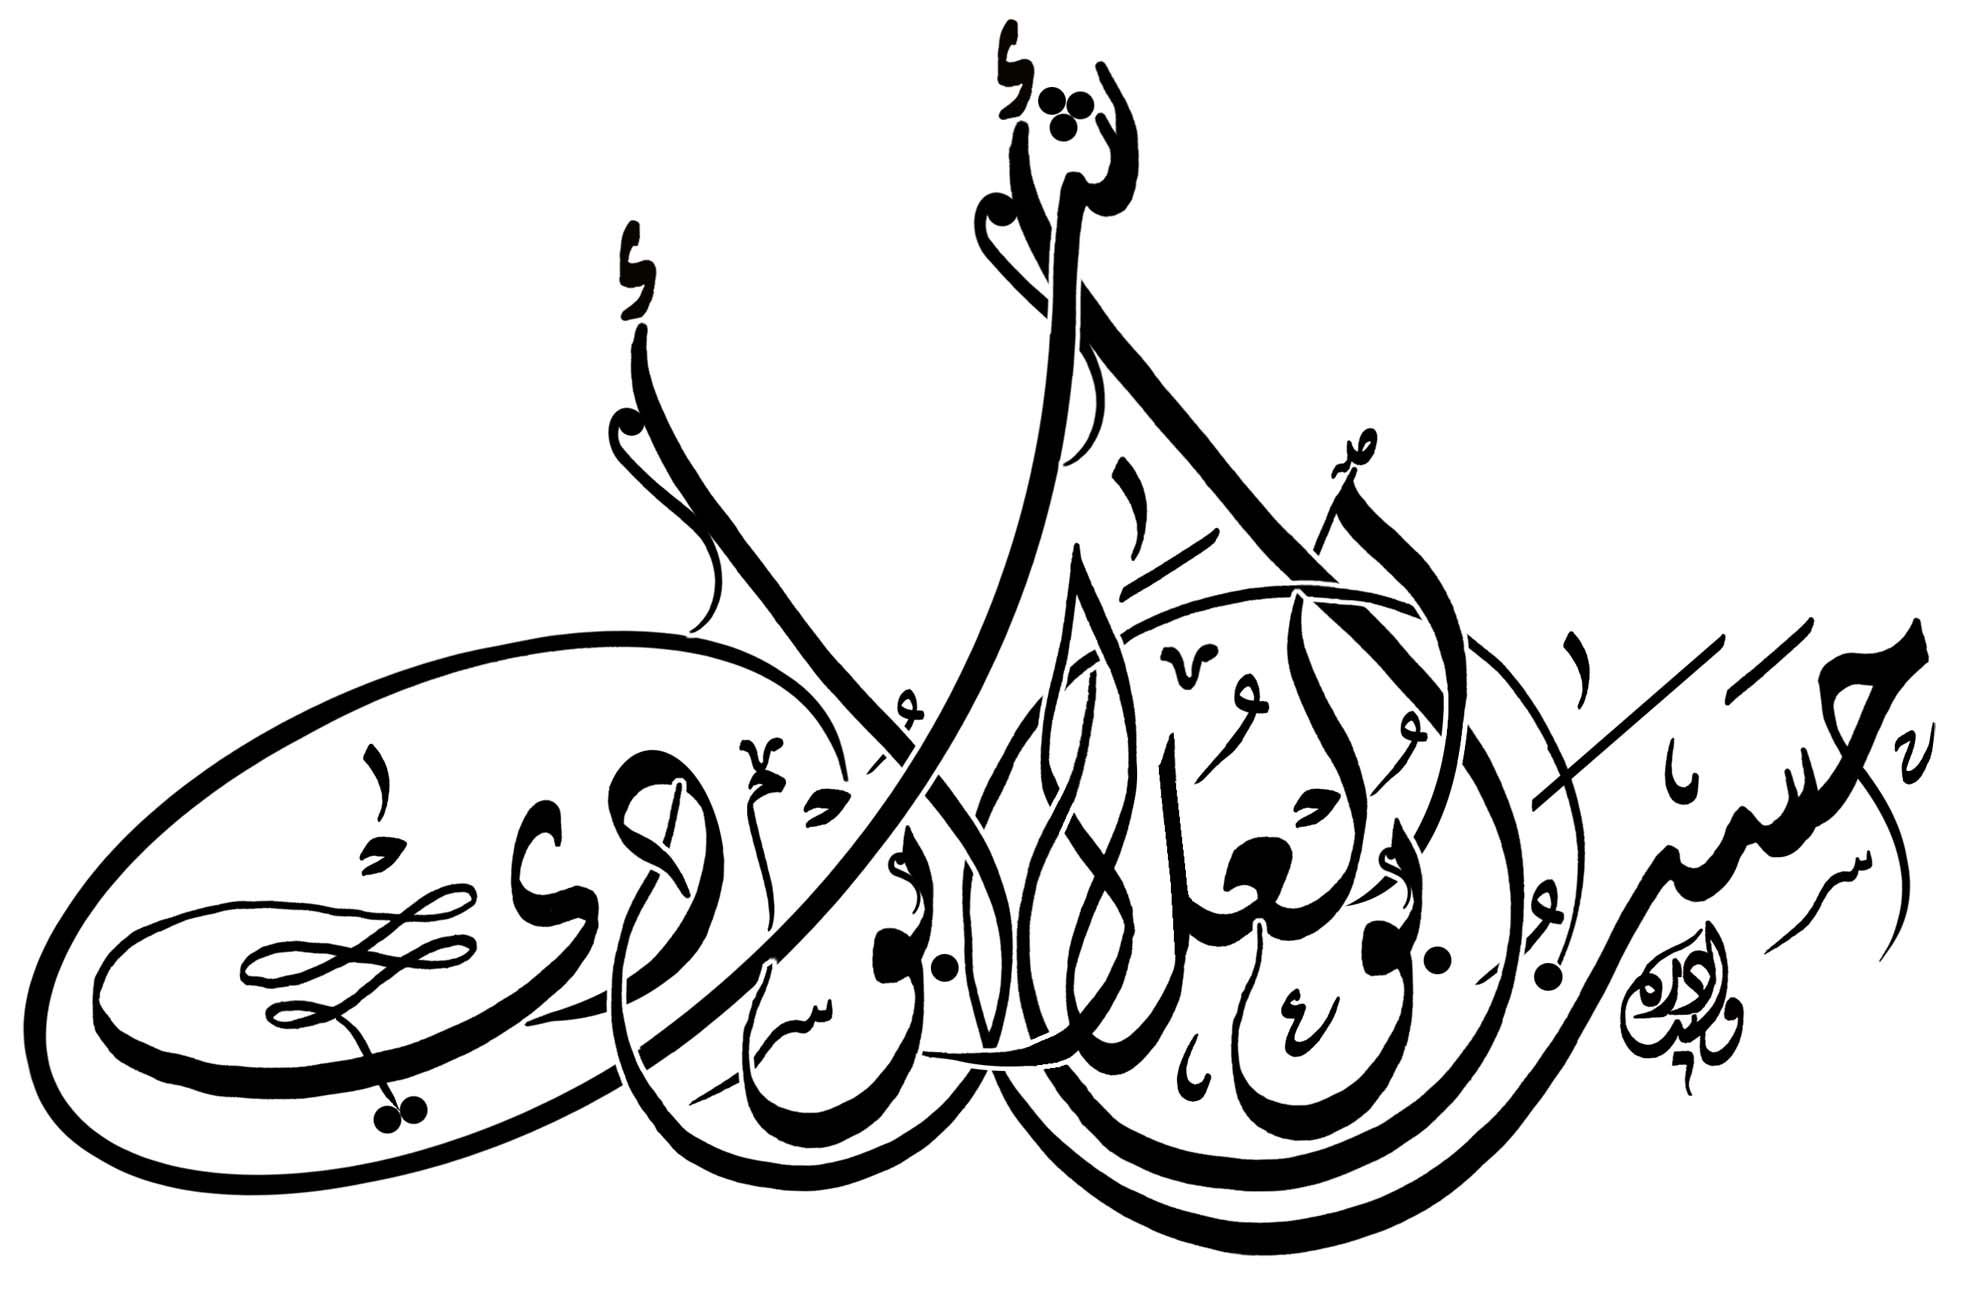 Calligraphy Handwriting Typing Waleeddora وليد دره حسن أبو العلا أبو شادي خطوط عربية الديواني الجلي اسم Arabic Calligraphy Calligraphy Art